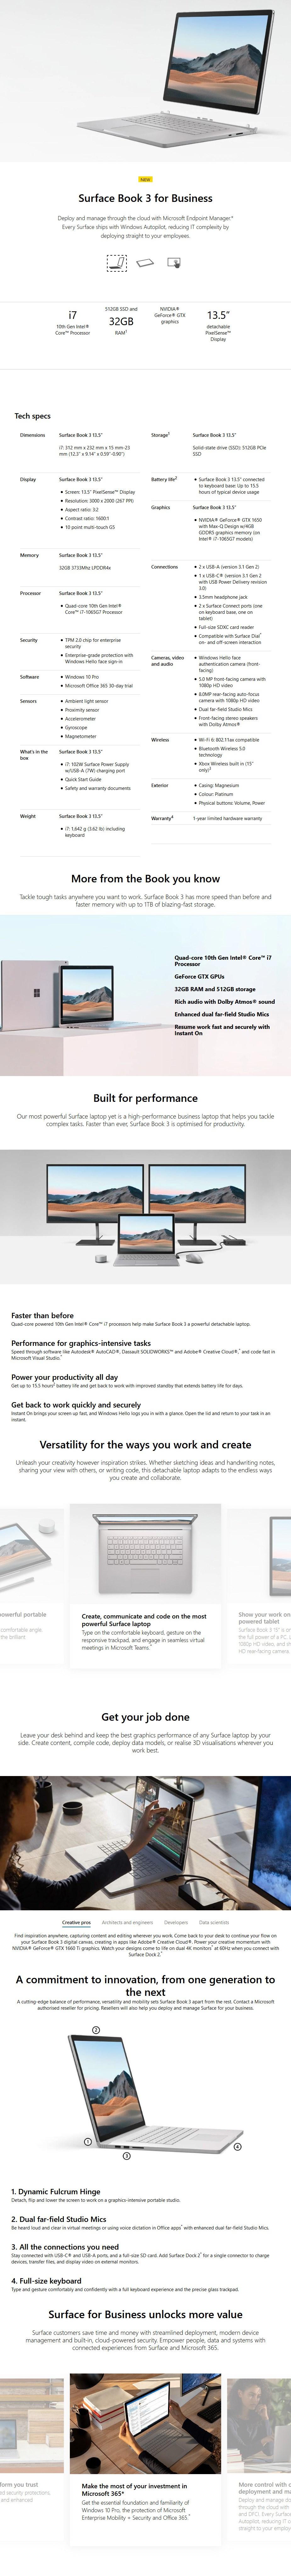 "Microsoft Surface Book 3 13.5"" i7-1065G7 32GB 512GB Nvidia GTX 1650 W10P - Overview 1"